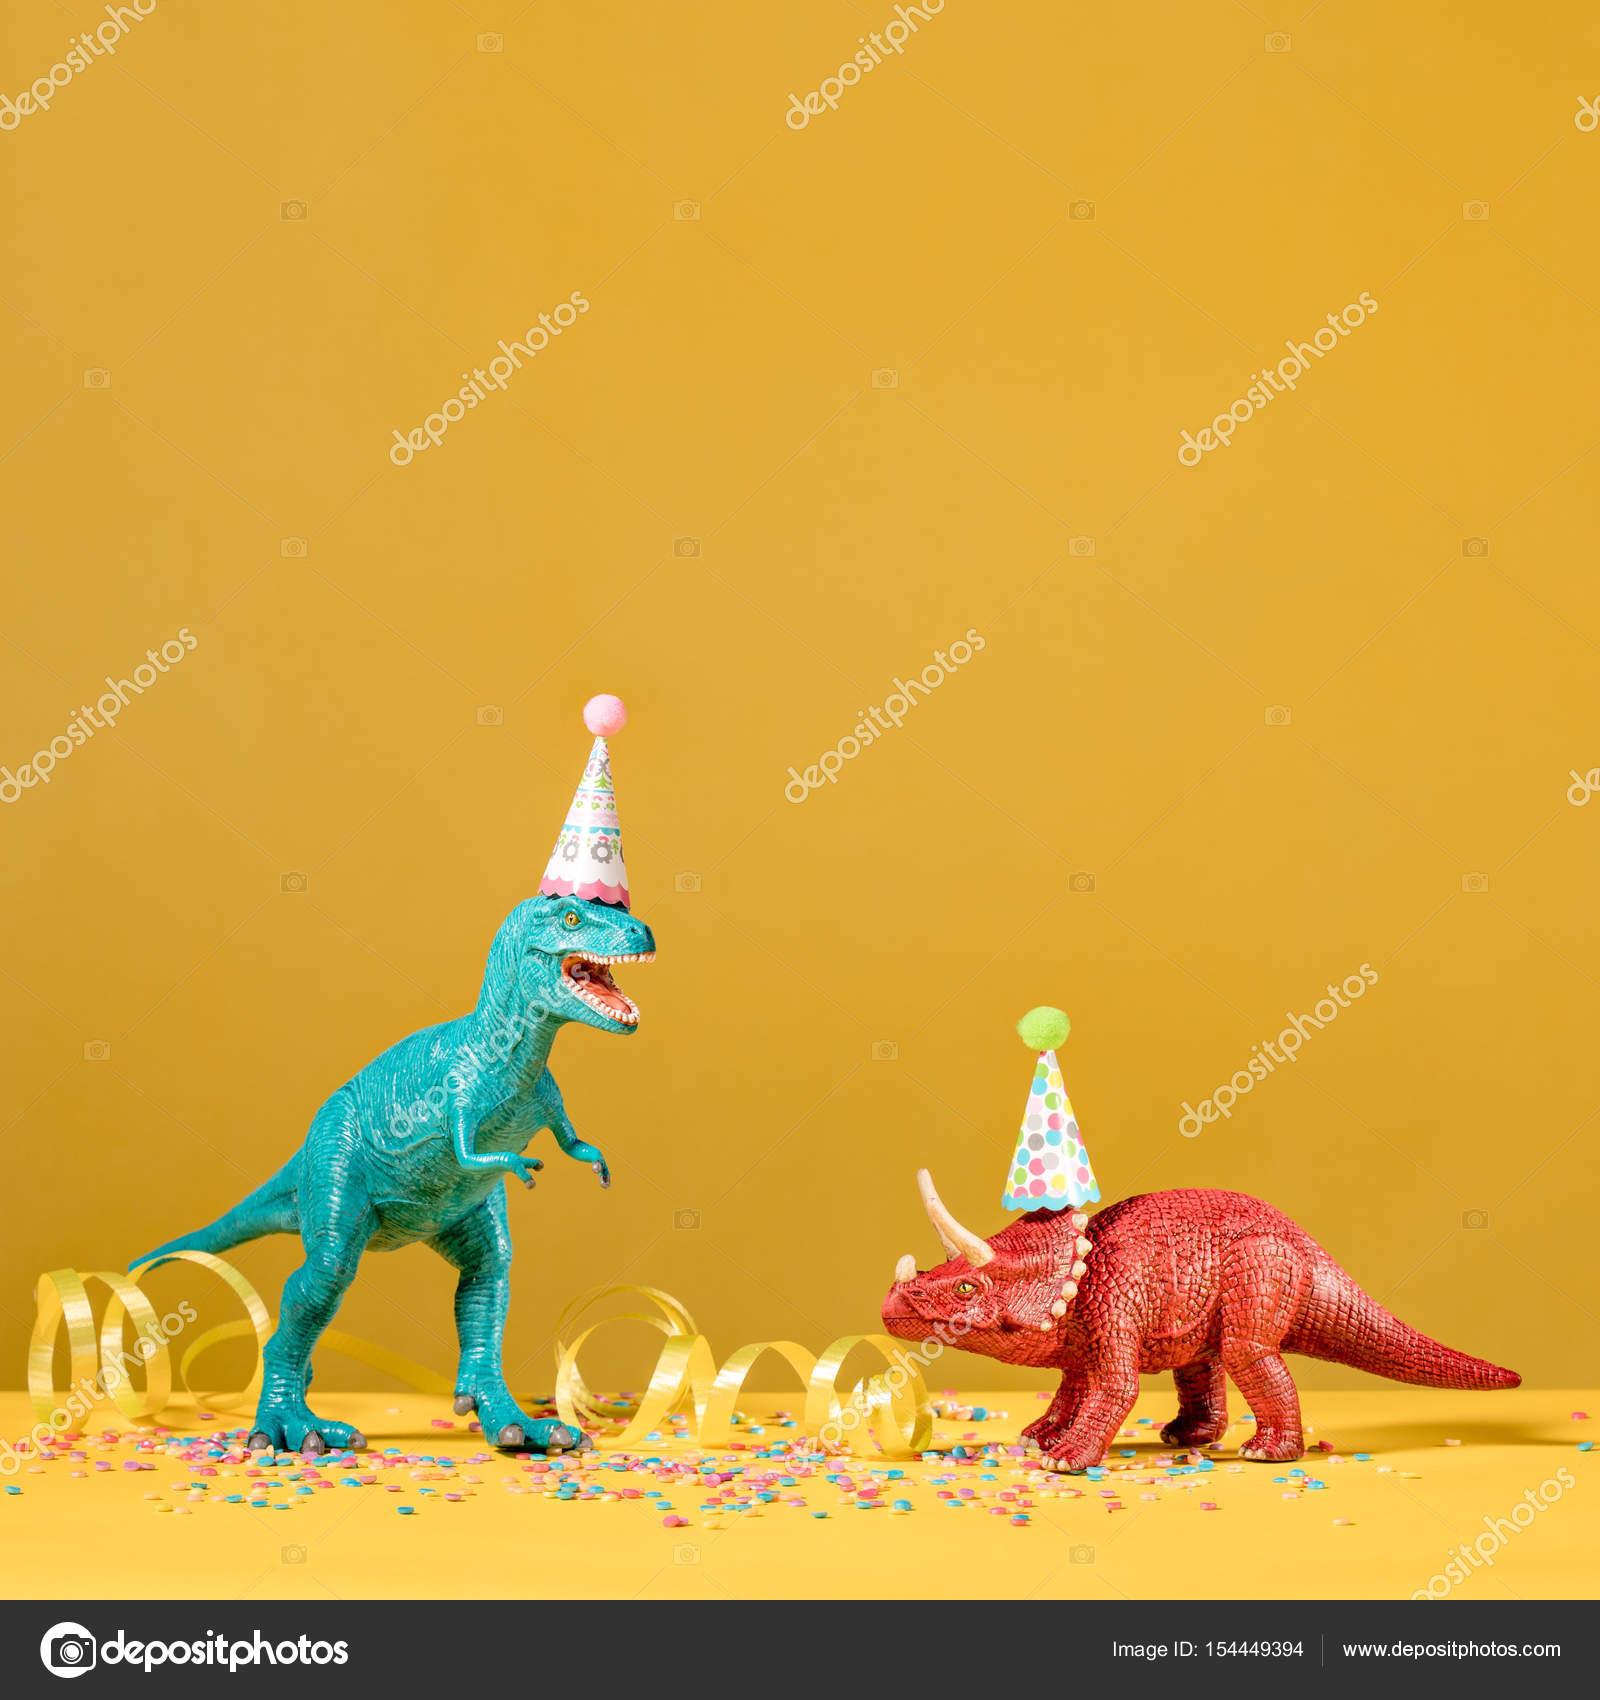 Background Dinosaur Party Birthday Dinosaur Party Stock Photo Juliannafunk 154449394